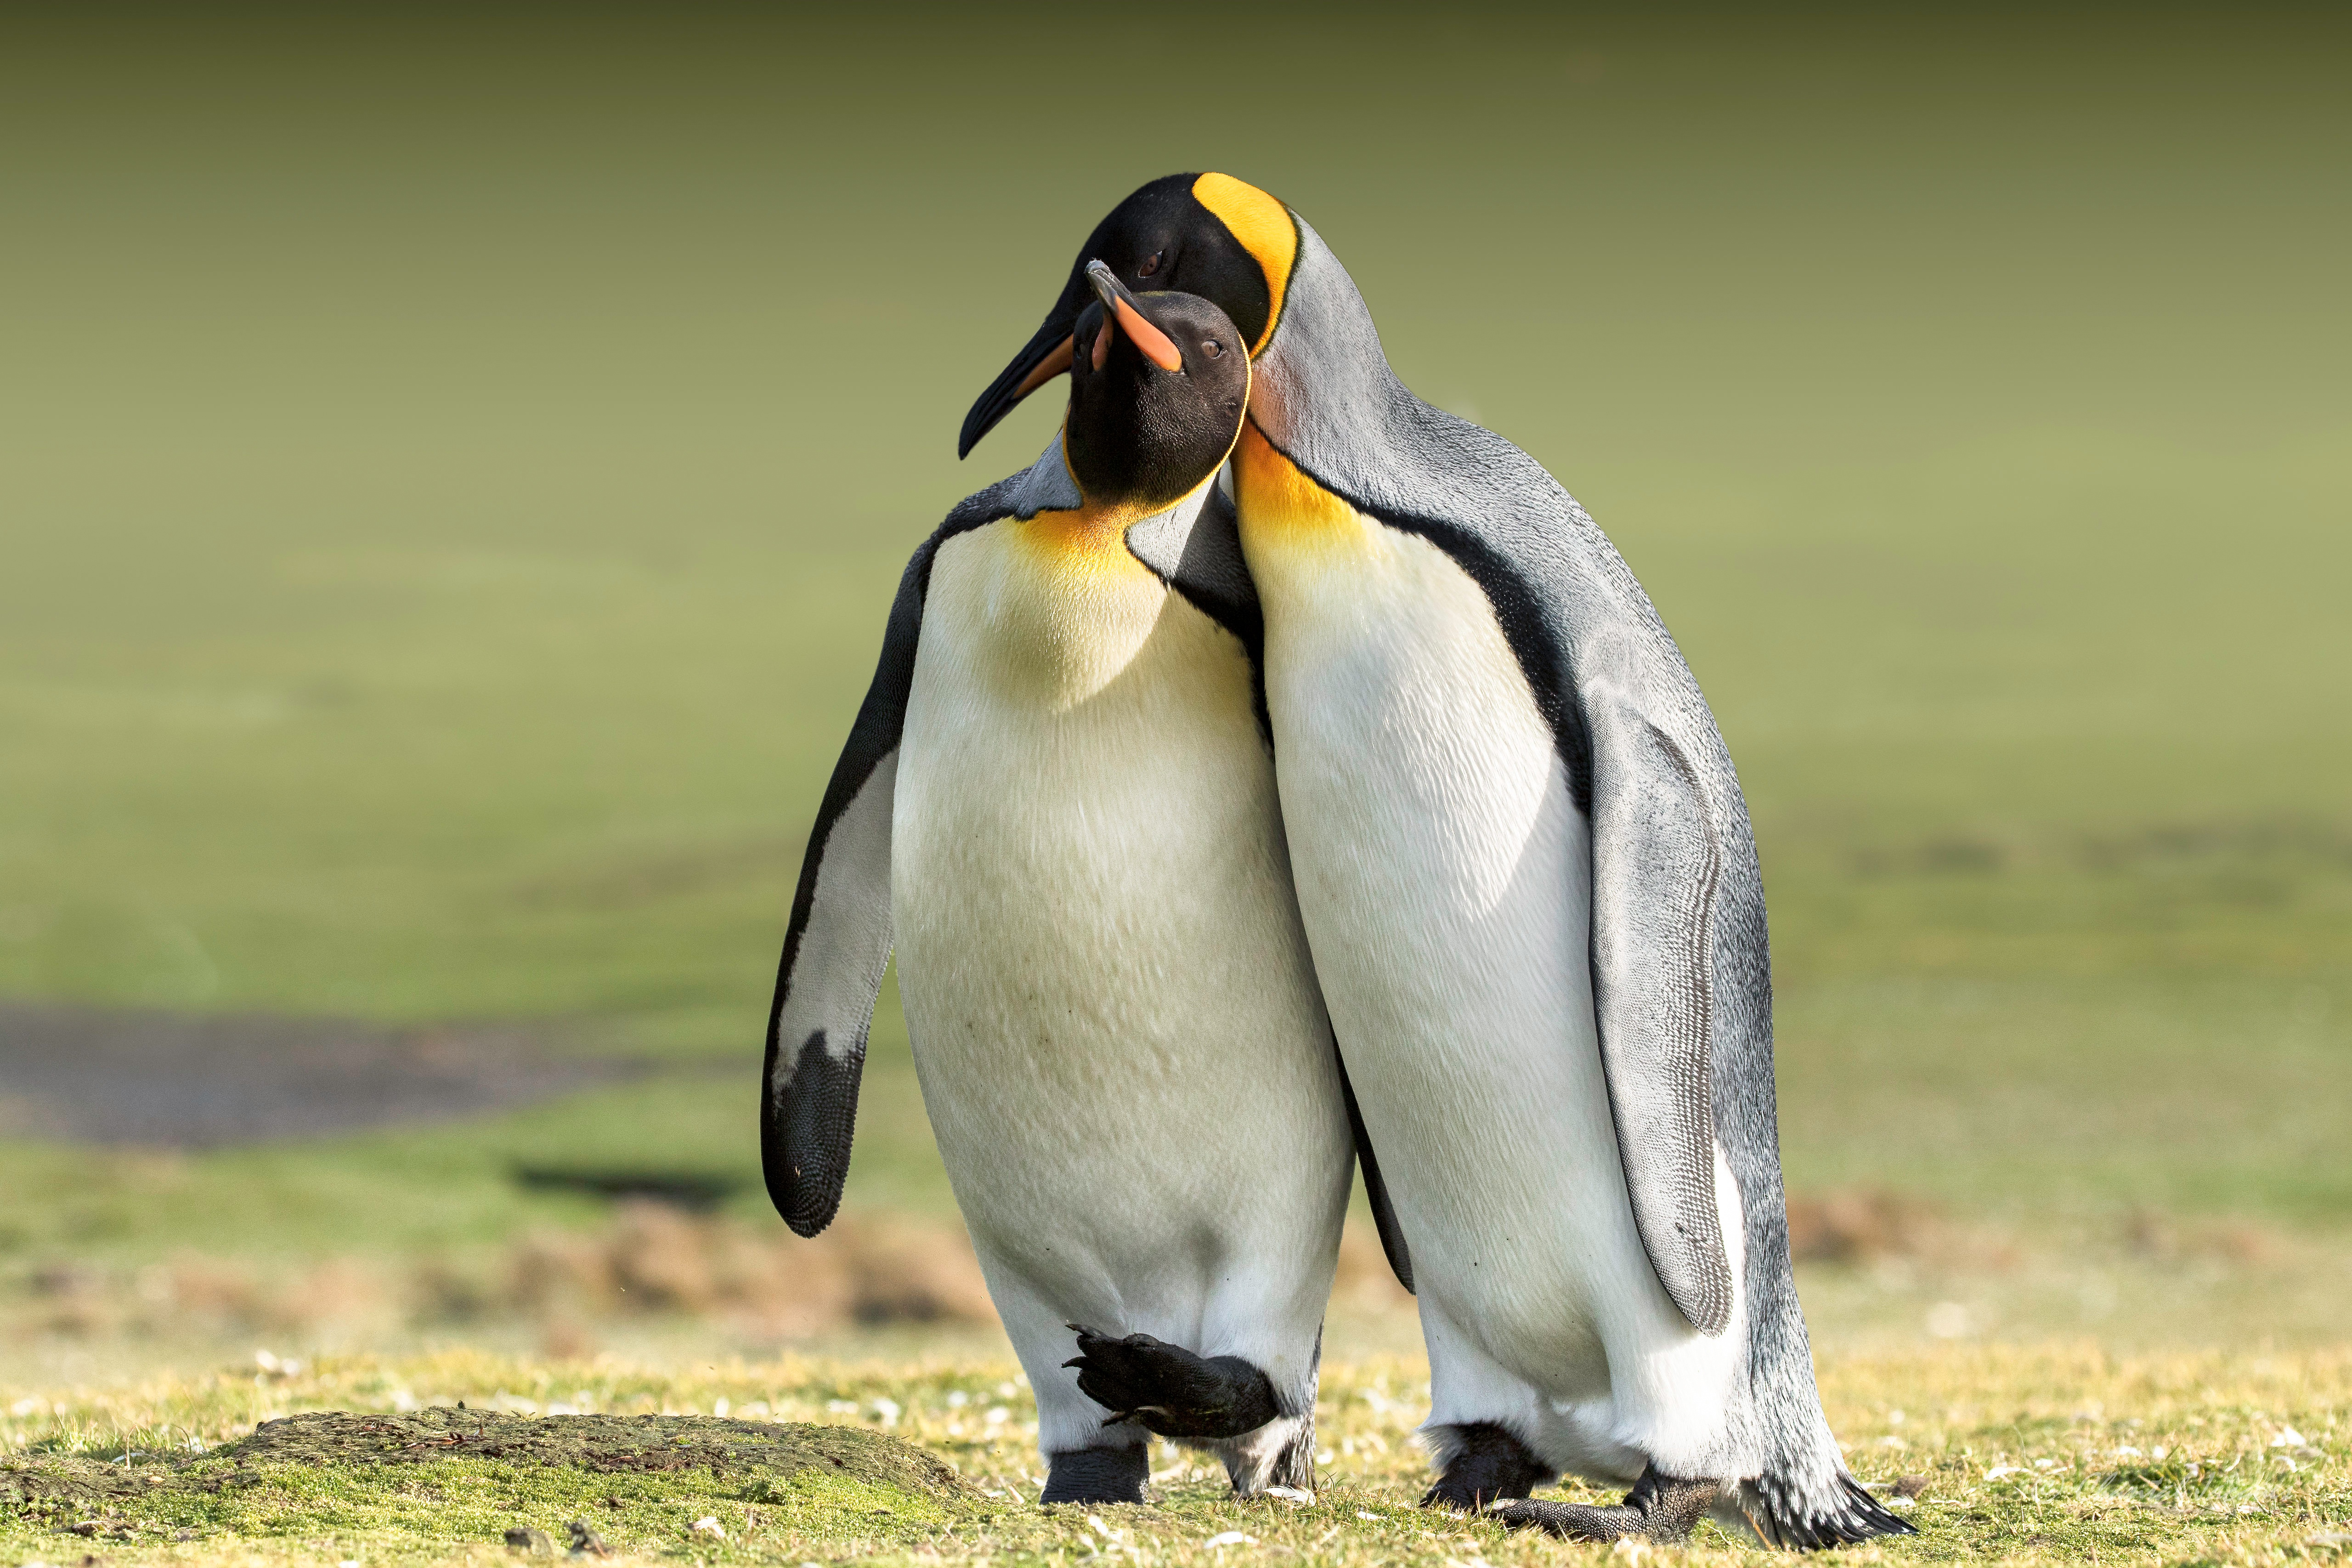 Two Penguins In Love 4k Ultra HD Wallpaper   Background